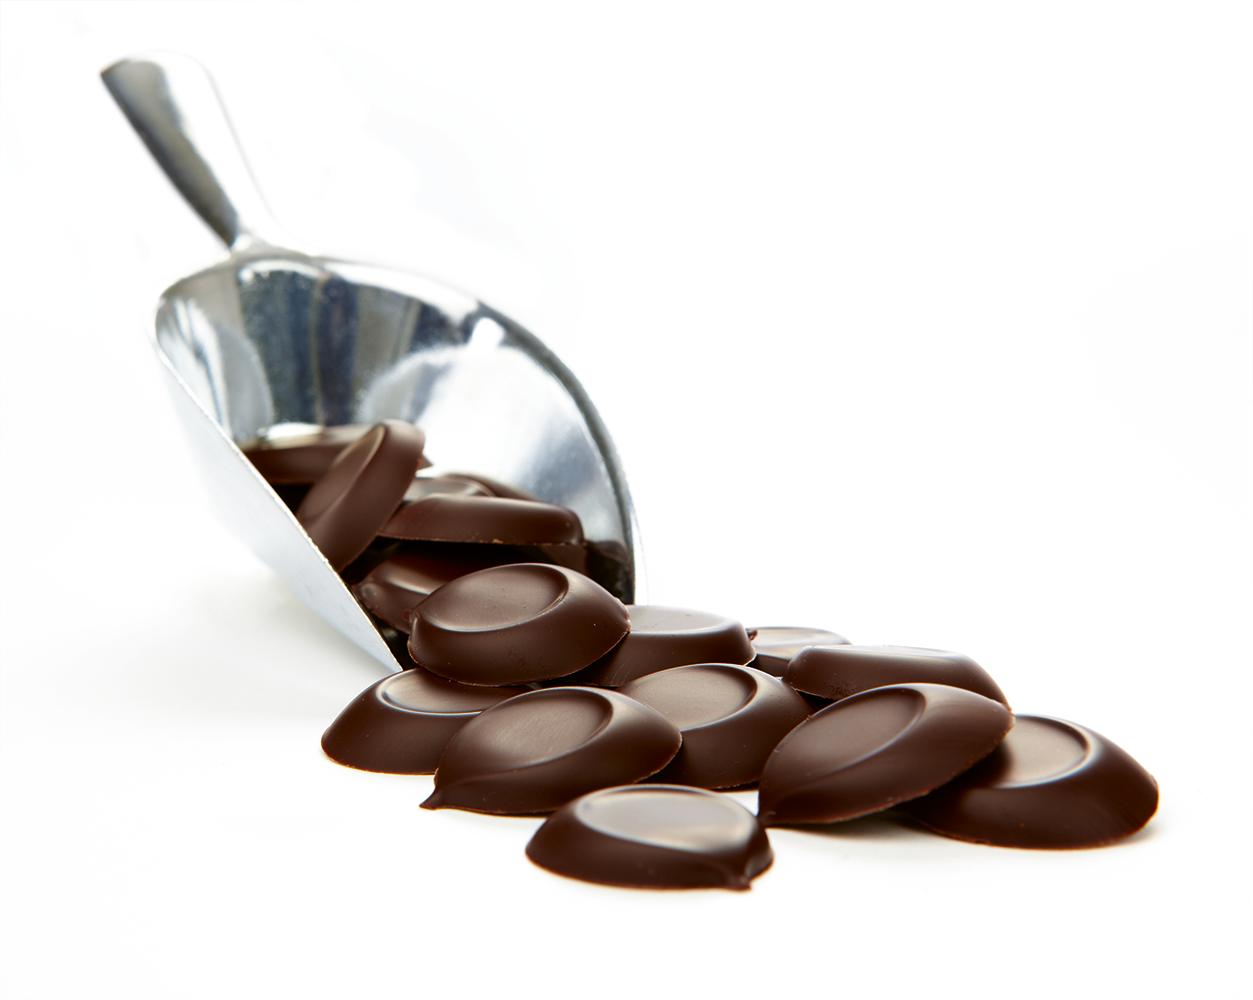 Cavalier Stevia gourmet chocolate Dark 300g